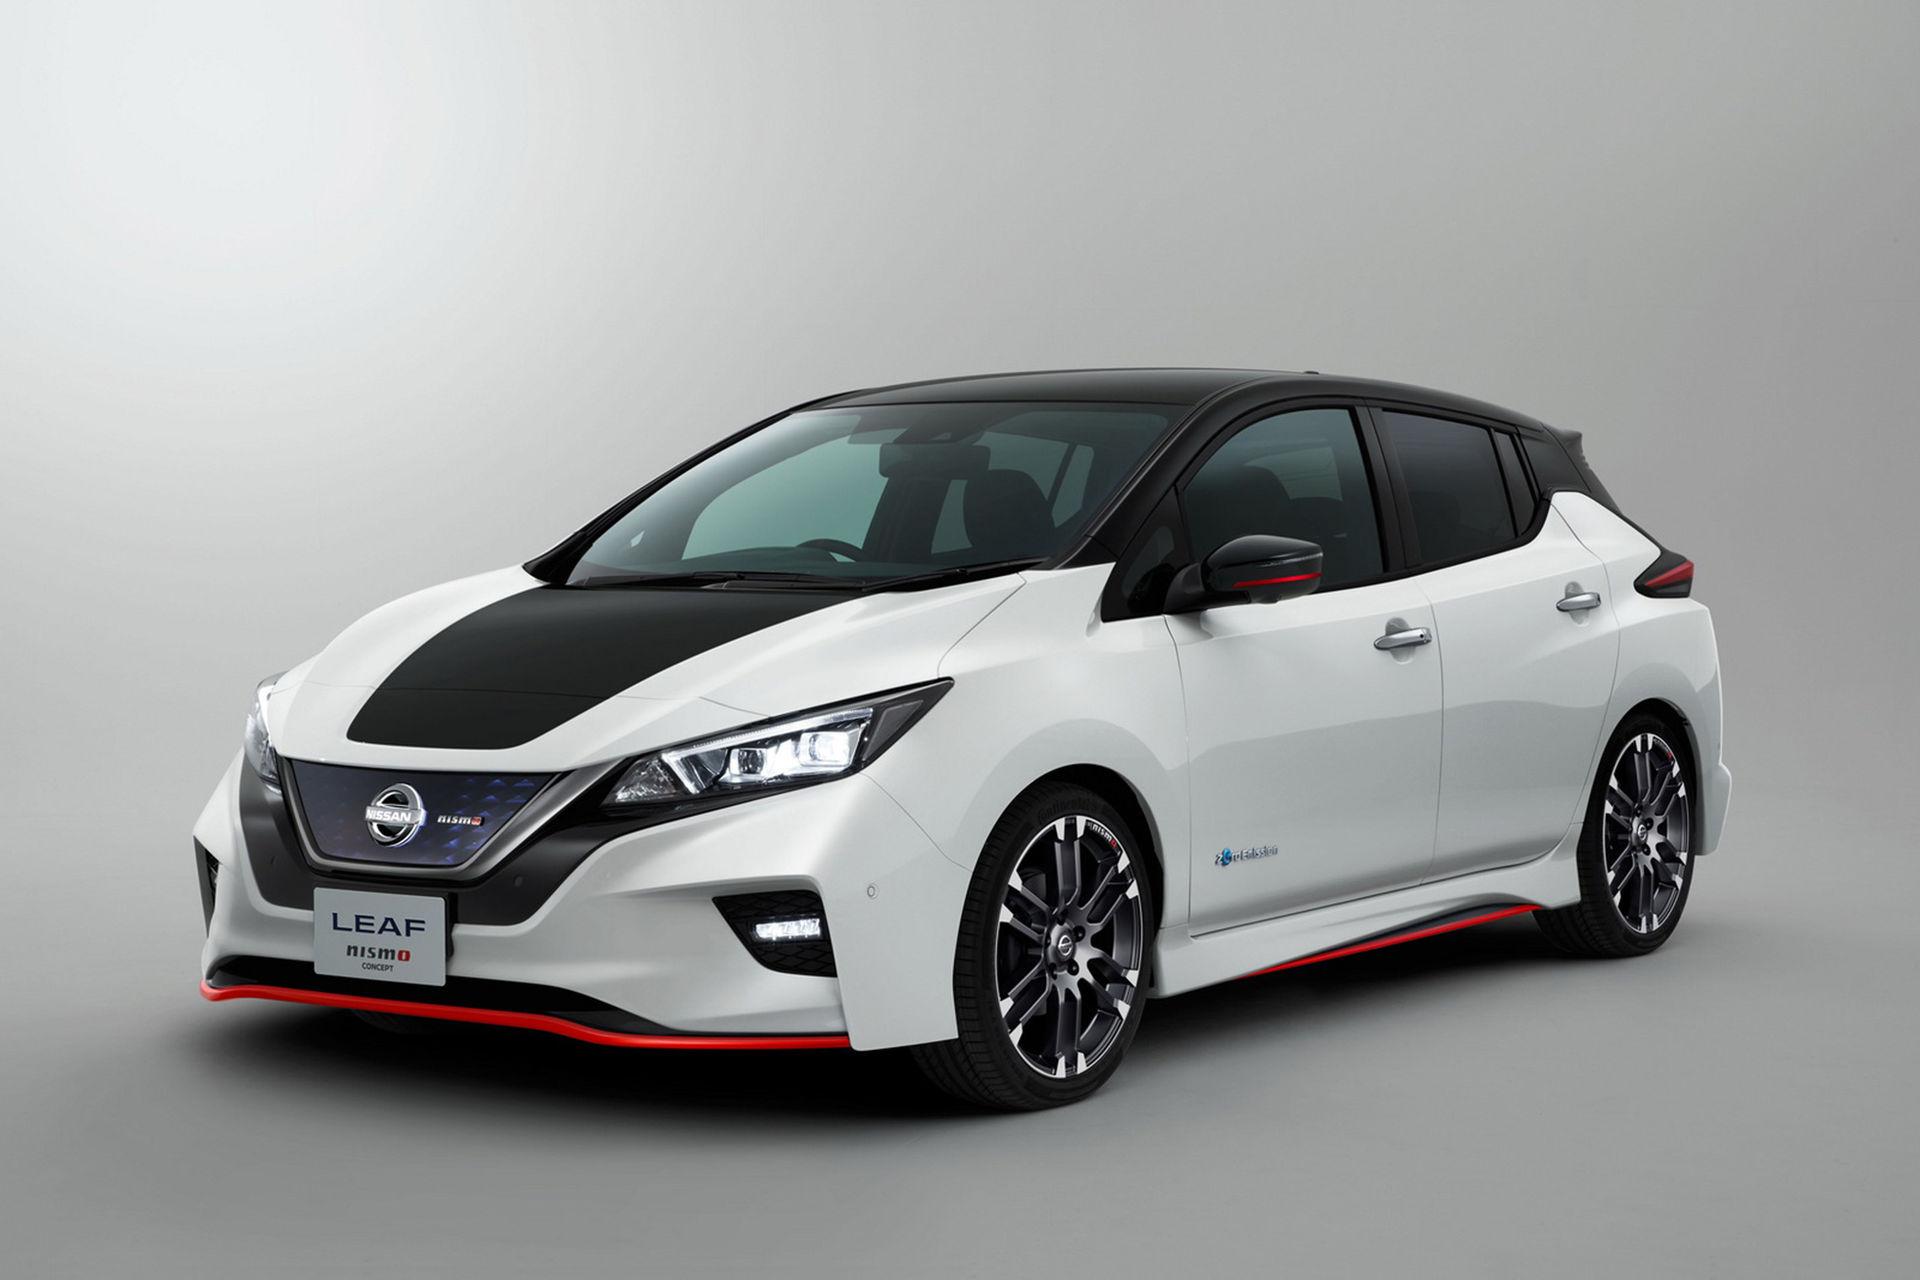 Nismo-paket sportar till nya Nissan Leaf